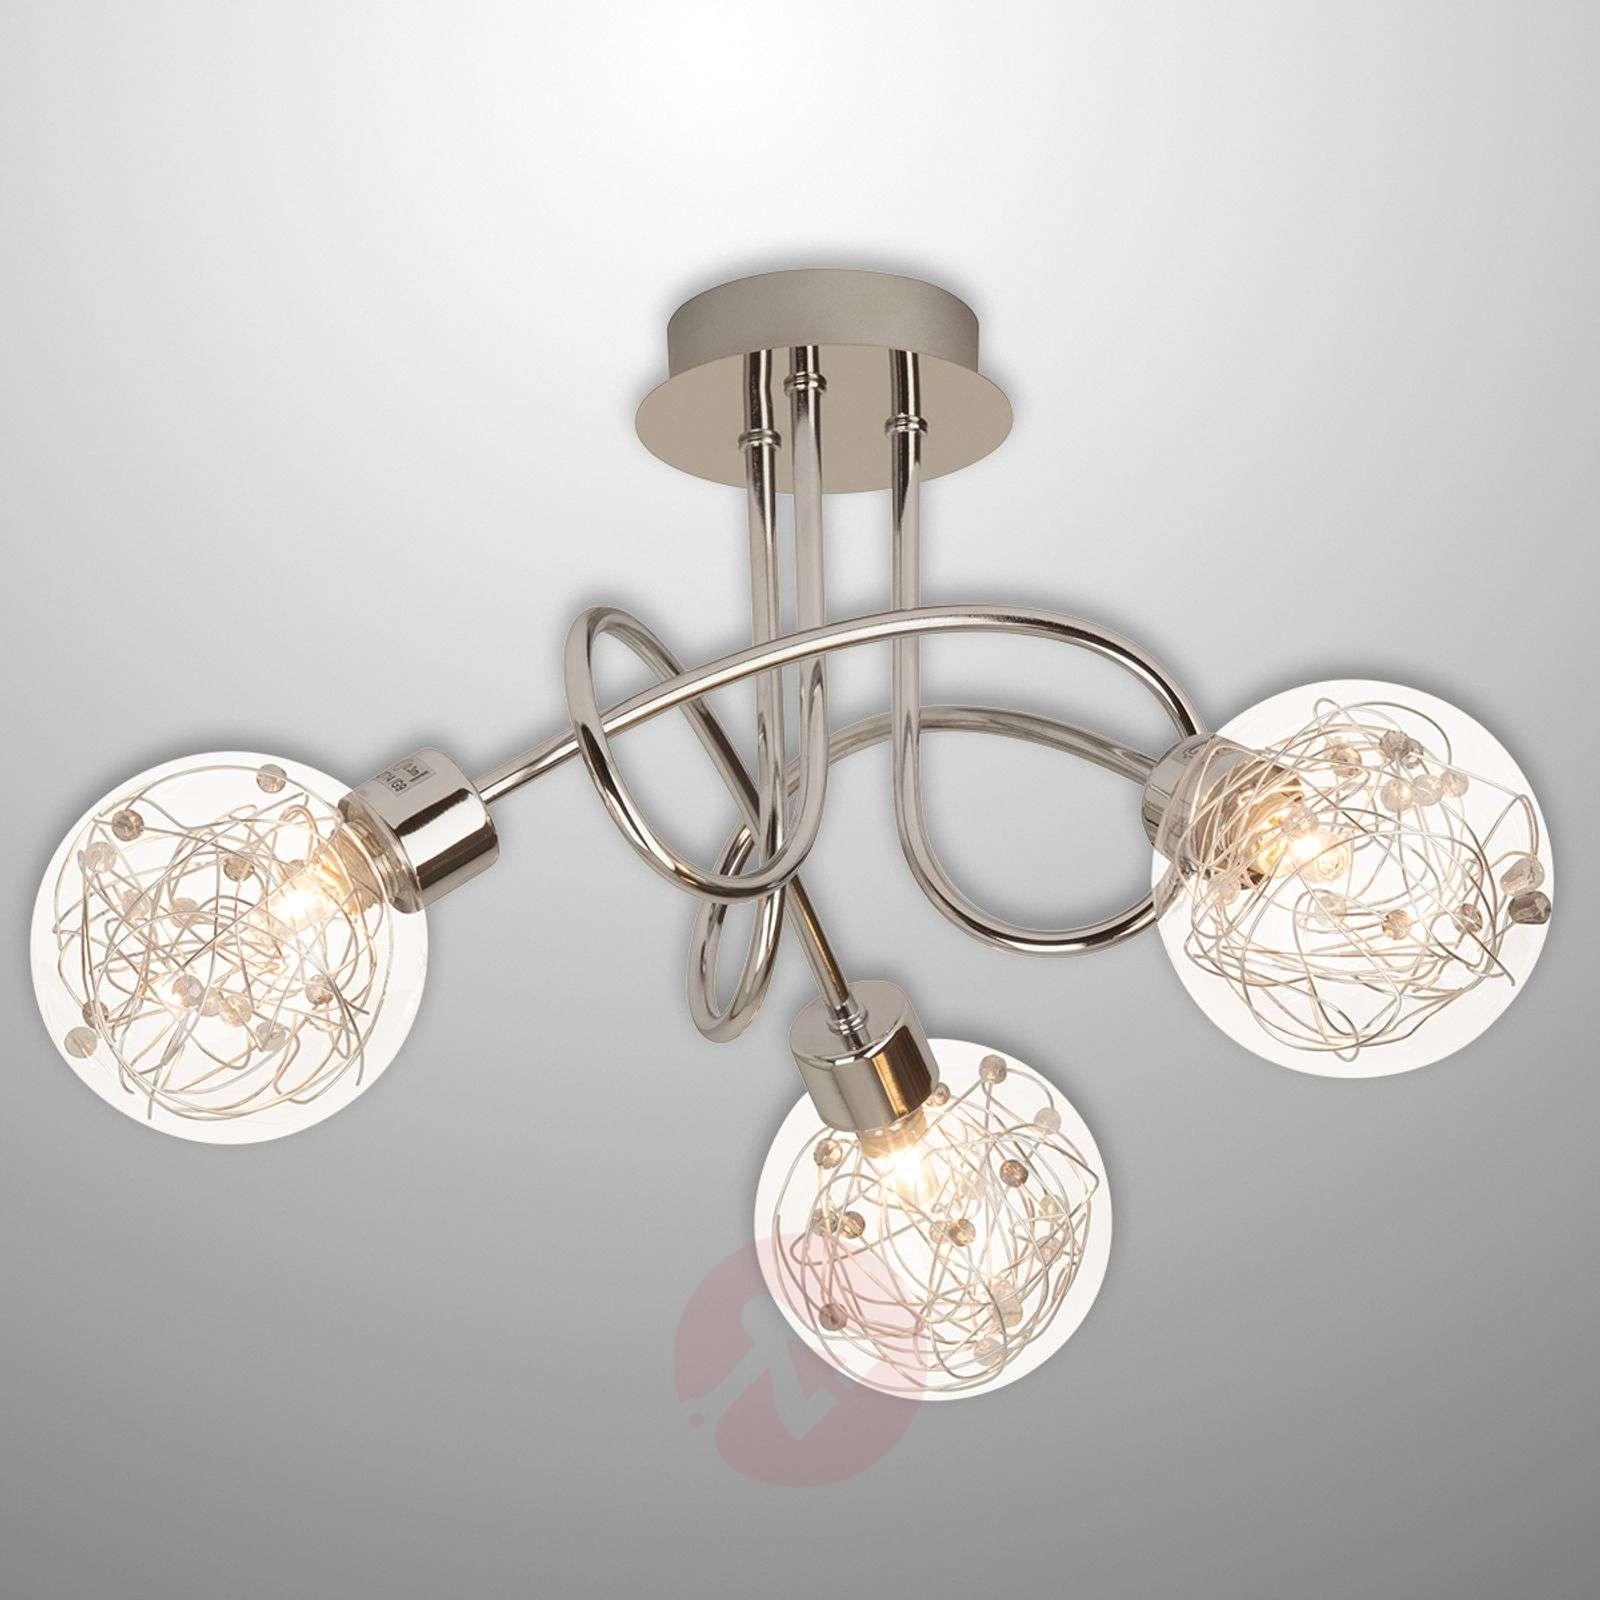 Joya - 3-bulb ceiling light with glass lampshades_1509046_1